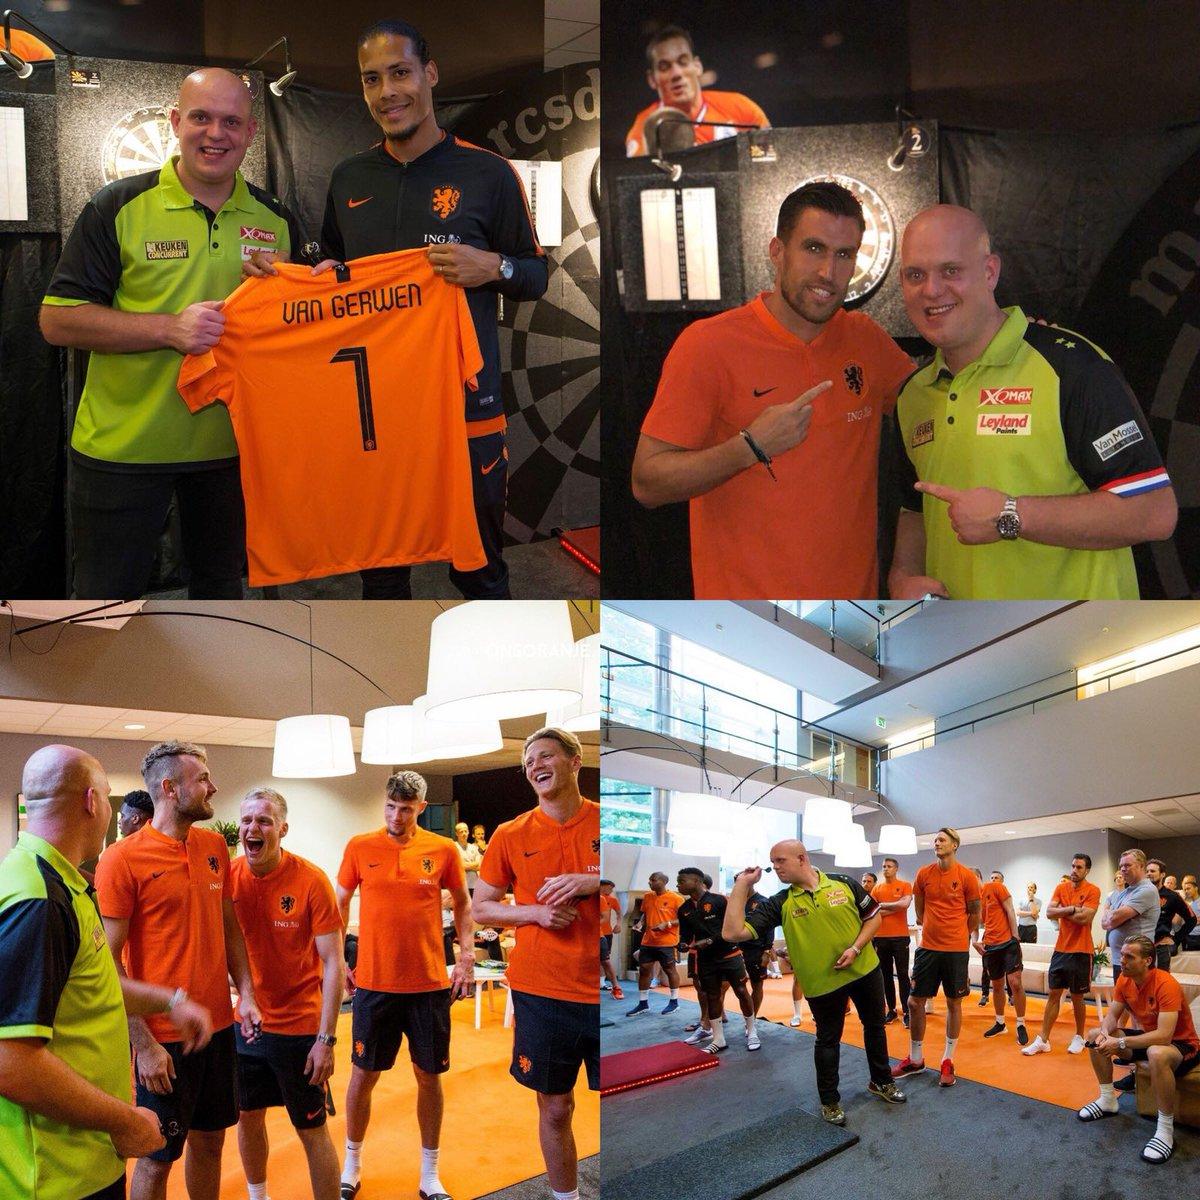 FEATURE | Van Gerwen Enjoys Darts Evening With Dutch Football Squad: michaelvangerwen.com/van-gerwen-enj… #Darts #Football @RonaldKoeman @Persie_Official